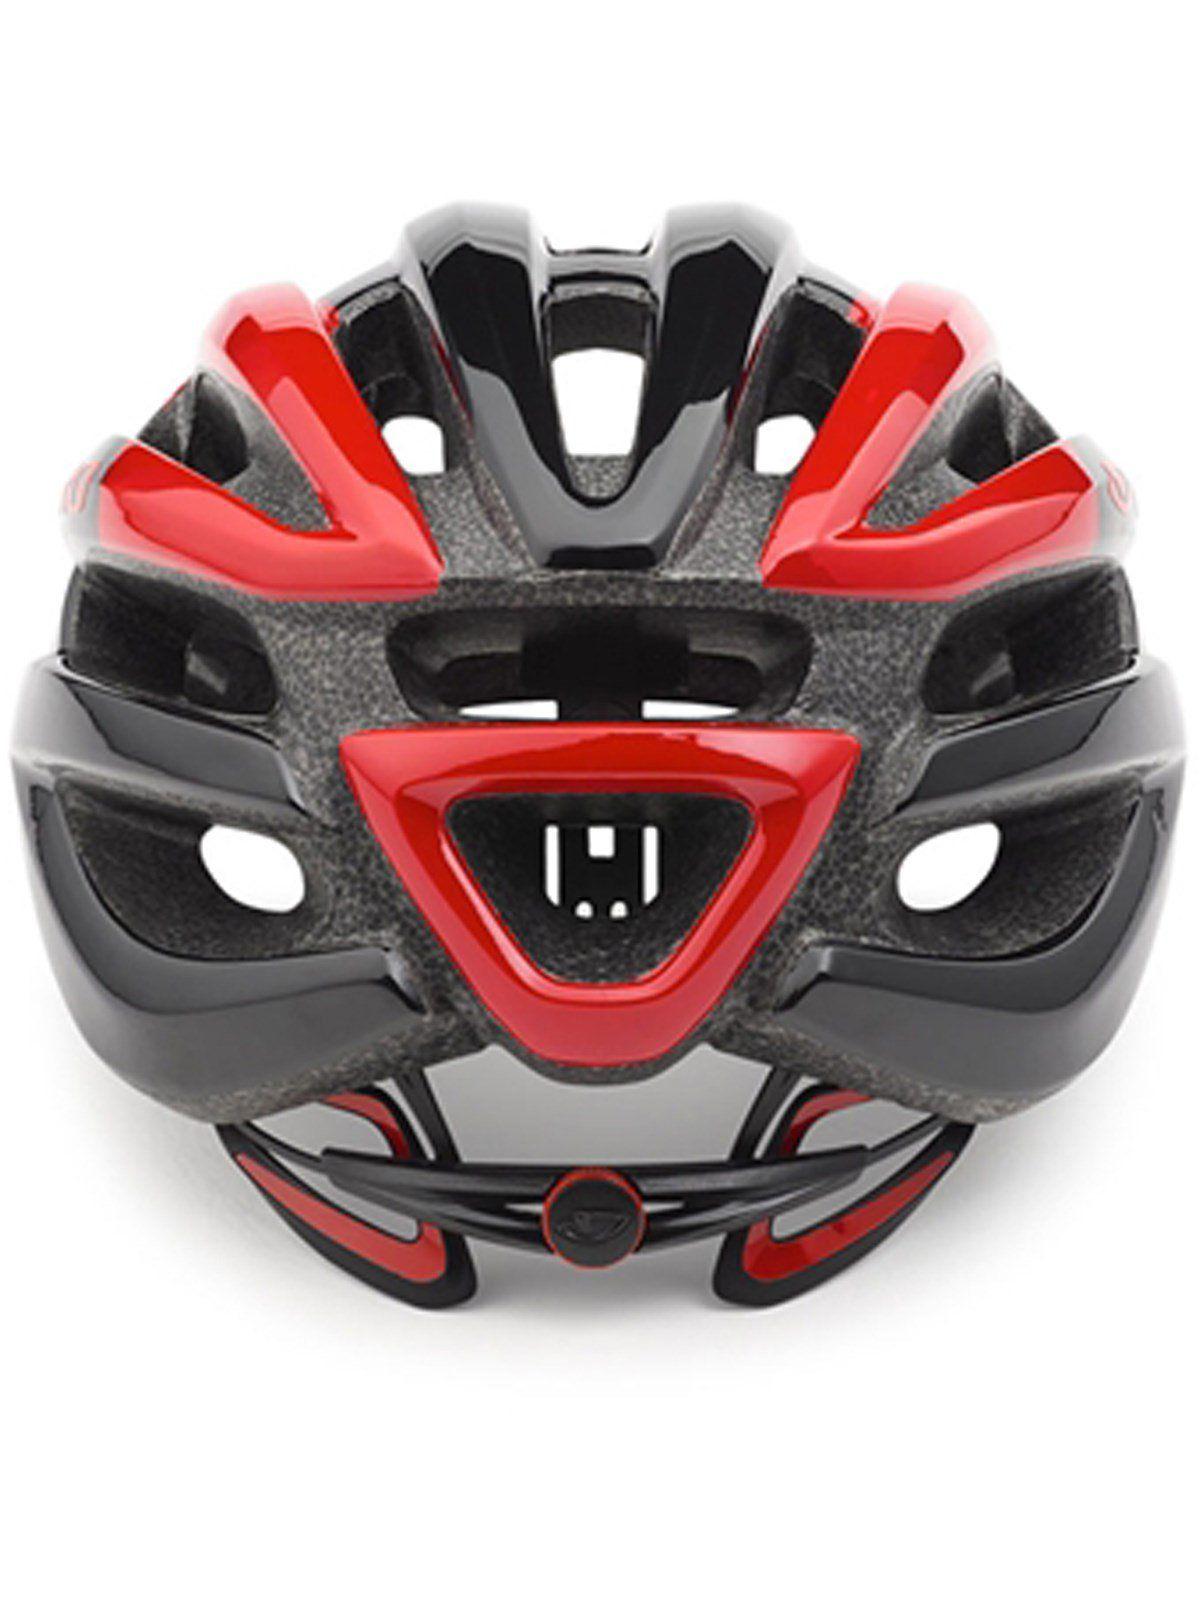 Capacete Giro Foray MTB Speed Preto Vermelho